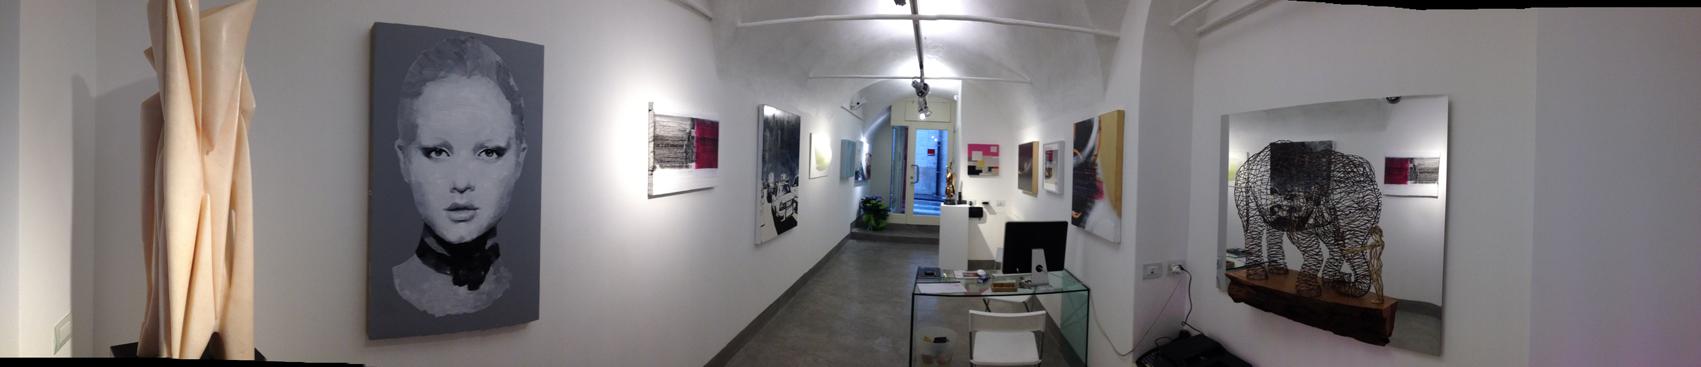 Veduta della nuova sede di Cerruti Arte, Santa Margherita Ligure (GE)